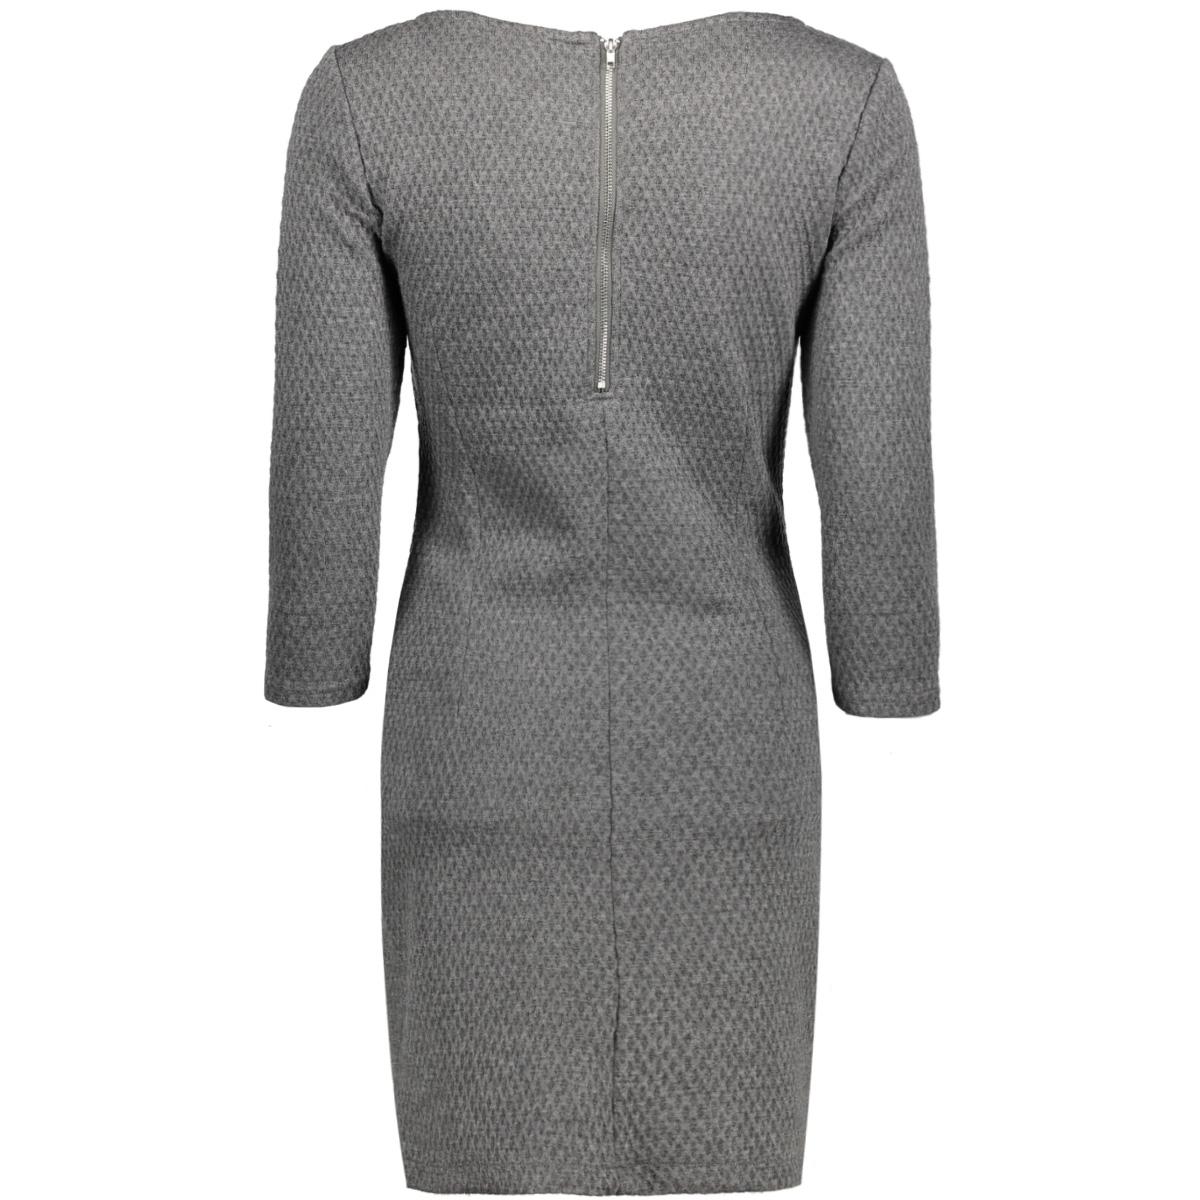 5018803.09.71 tom tailor jurk 2623